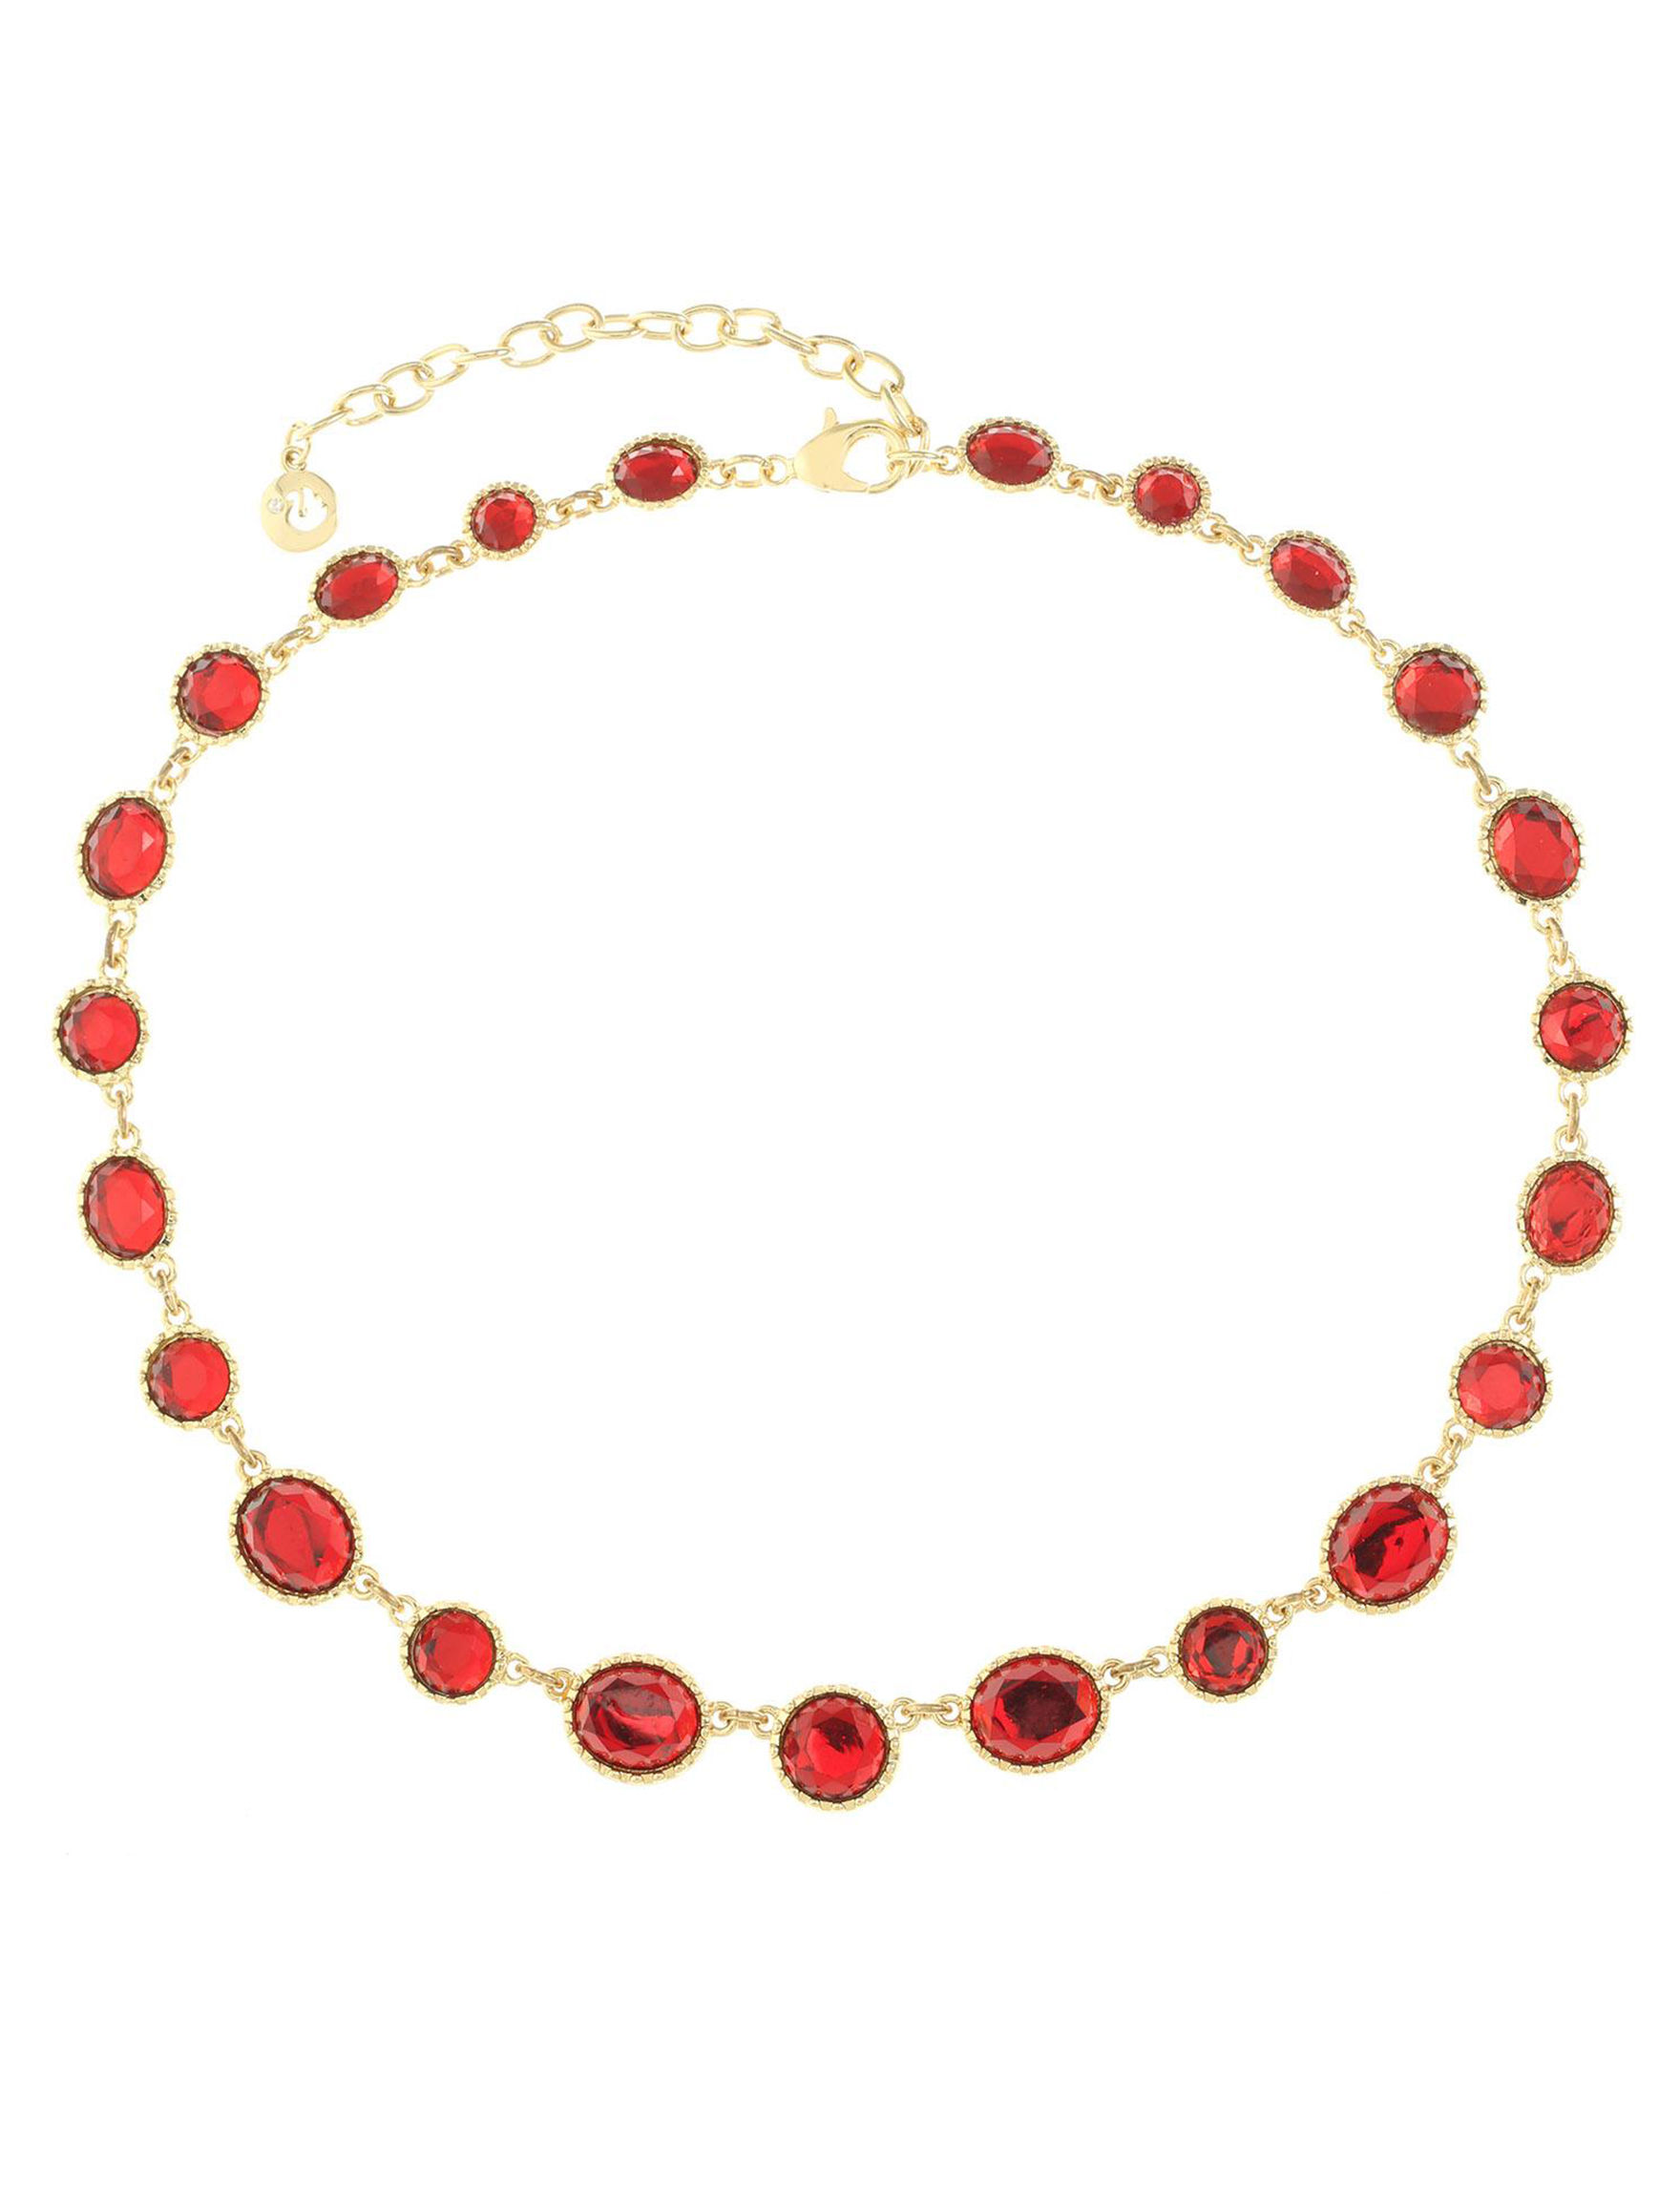 Gloria Vanderbilt Red / Gold Necklaces & Pendants Fashion Jewelry